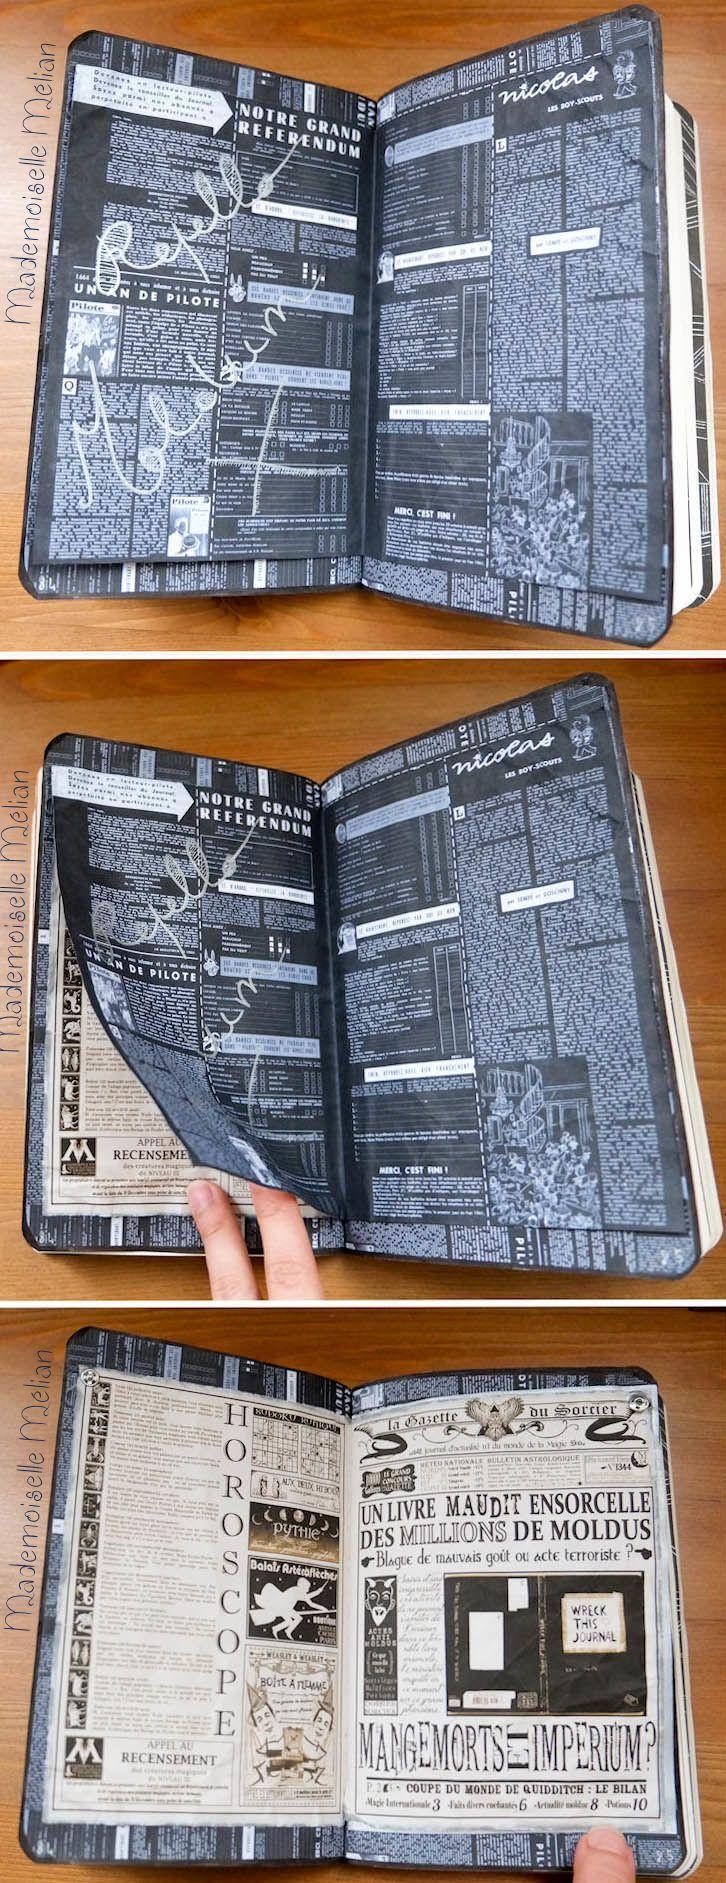 Scrapbook ideas about yourself - 25 Best Ideas About Scrapbook Journal On Pinterest Travel Journal Scrapbook Creative Journal And Scrapbooking